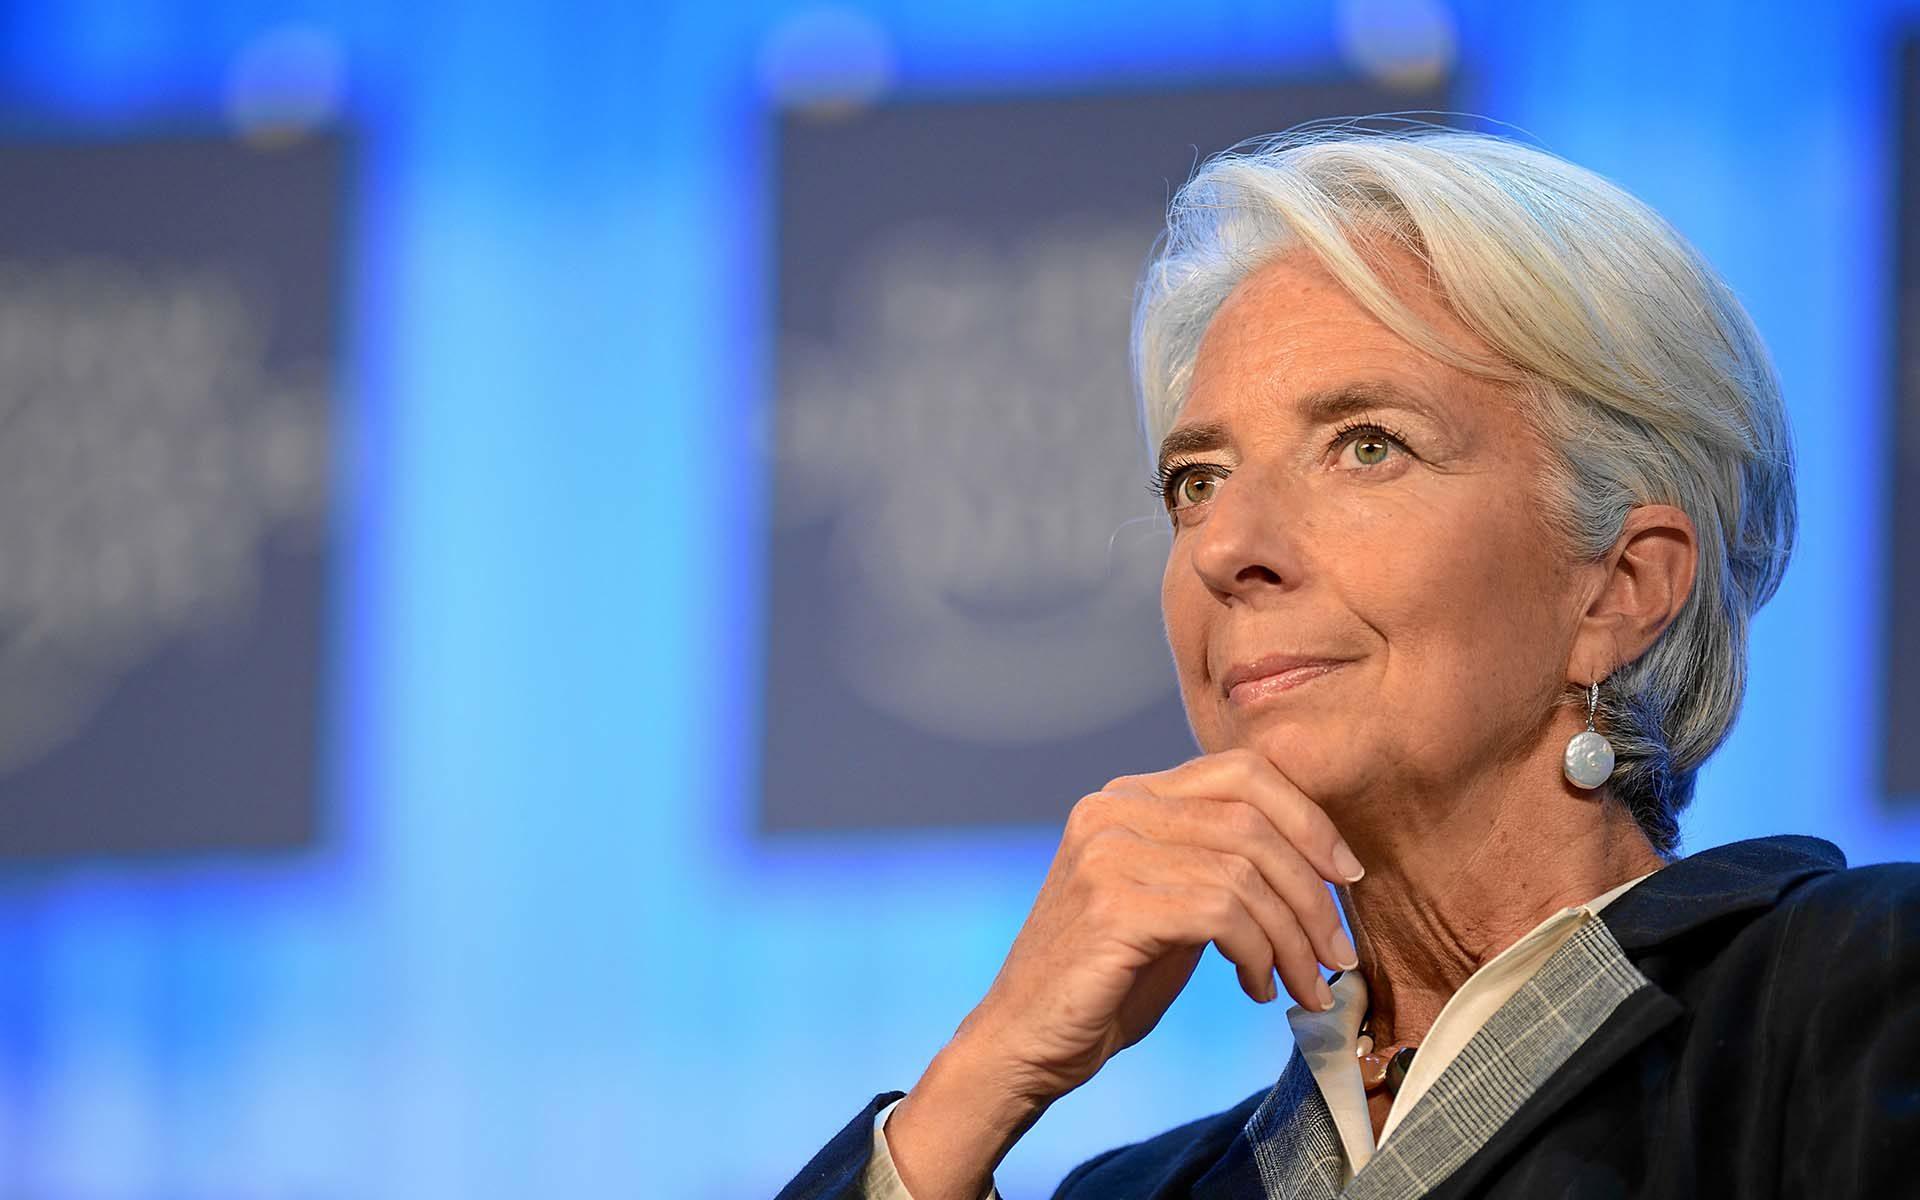 Bancos centrais querem emitir títulos de dívida usando Bitcoin e blockchain